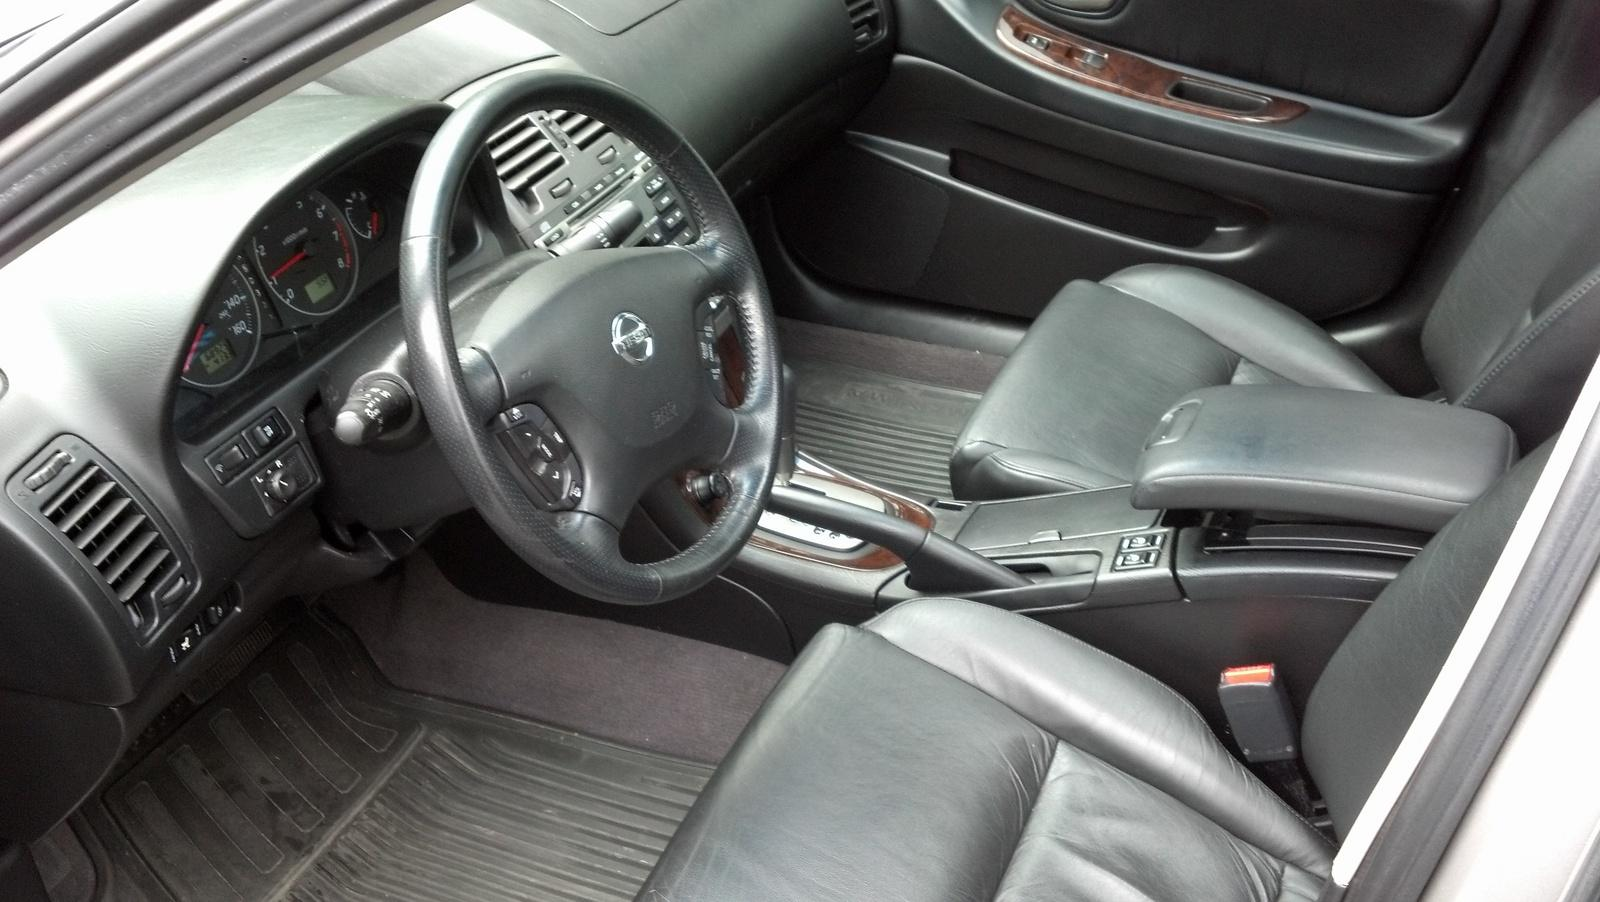 2002 nissan maxima interior images hd cars wallpaper 2002 nissan maxima interior images hd cars wallpaper 2002 nissan maxima interior images hd cars wallpaper vanachro Images